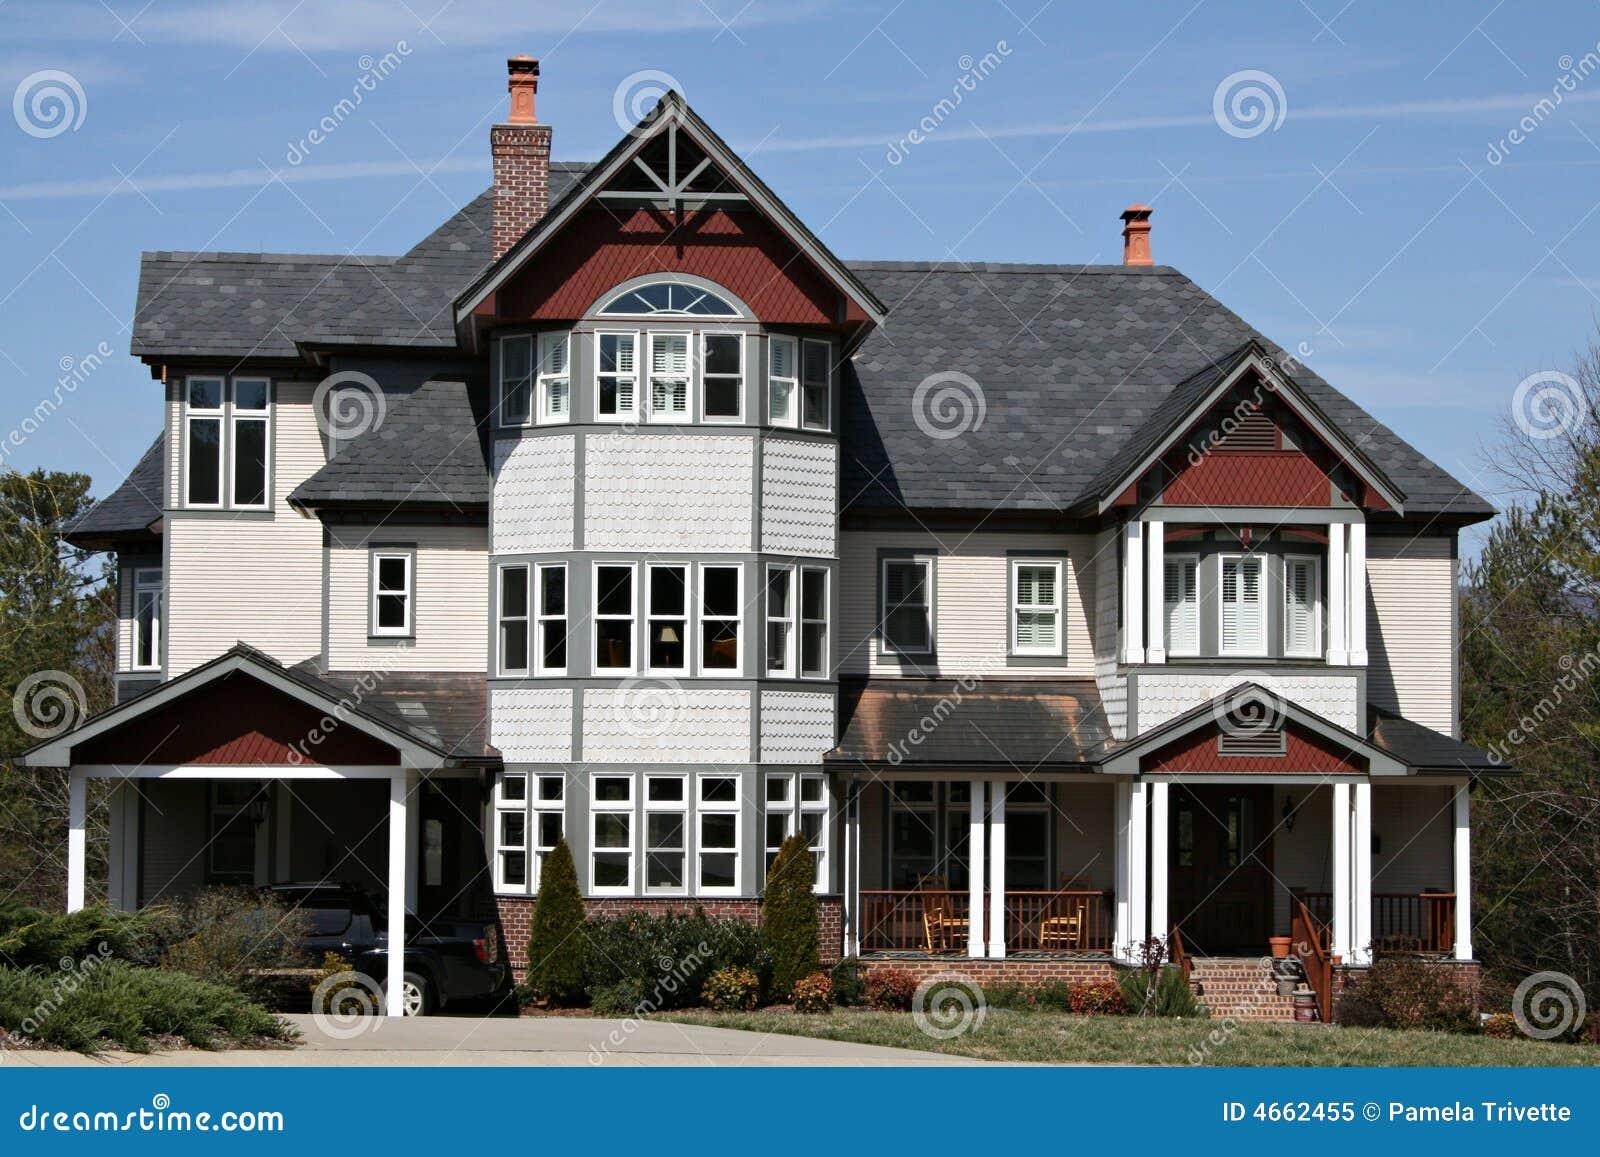 Large modern home